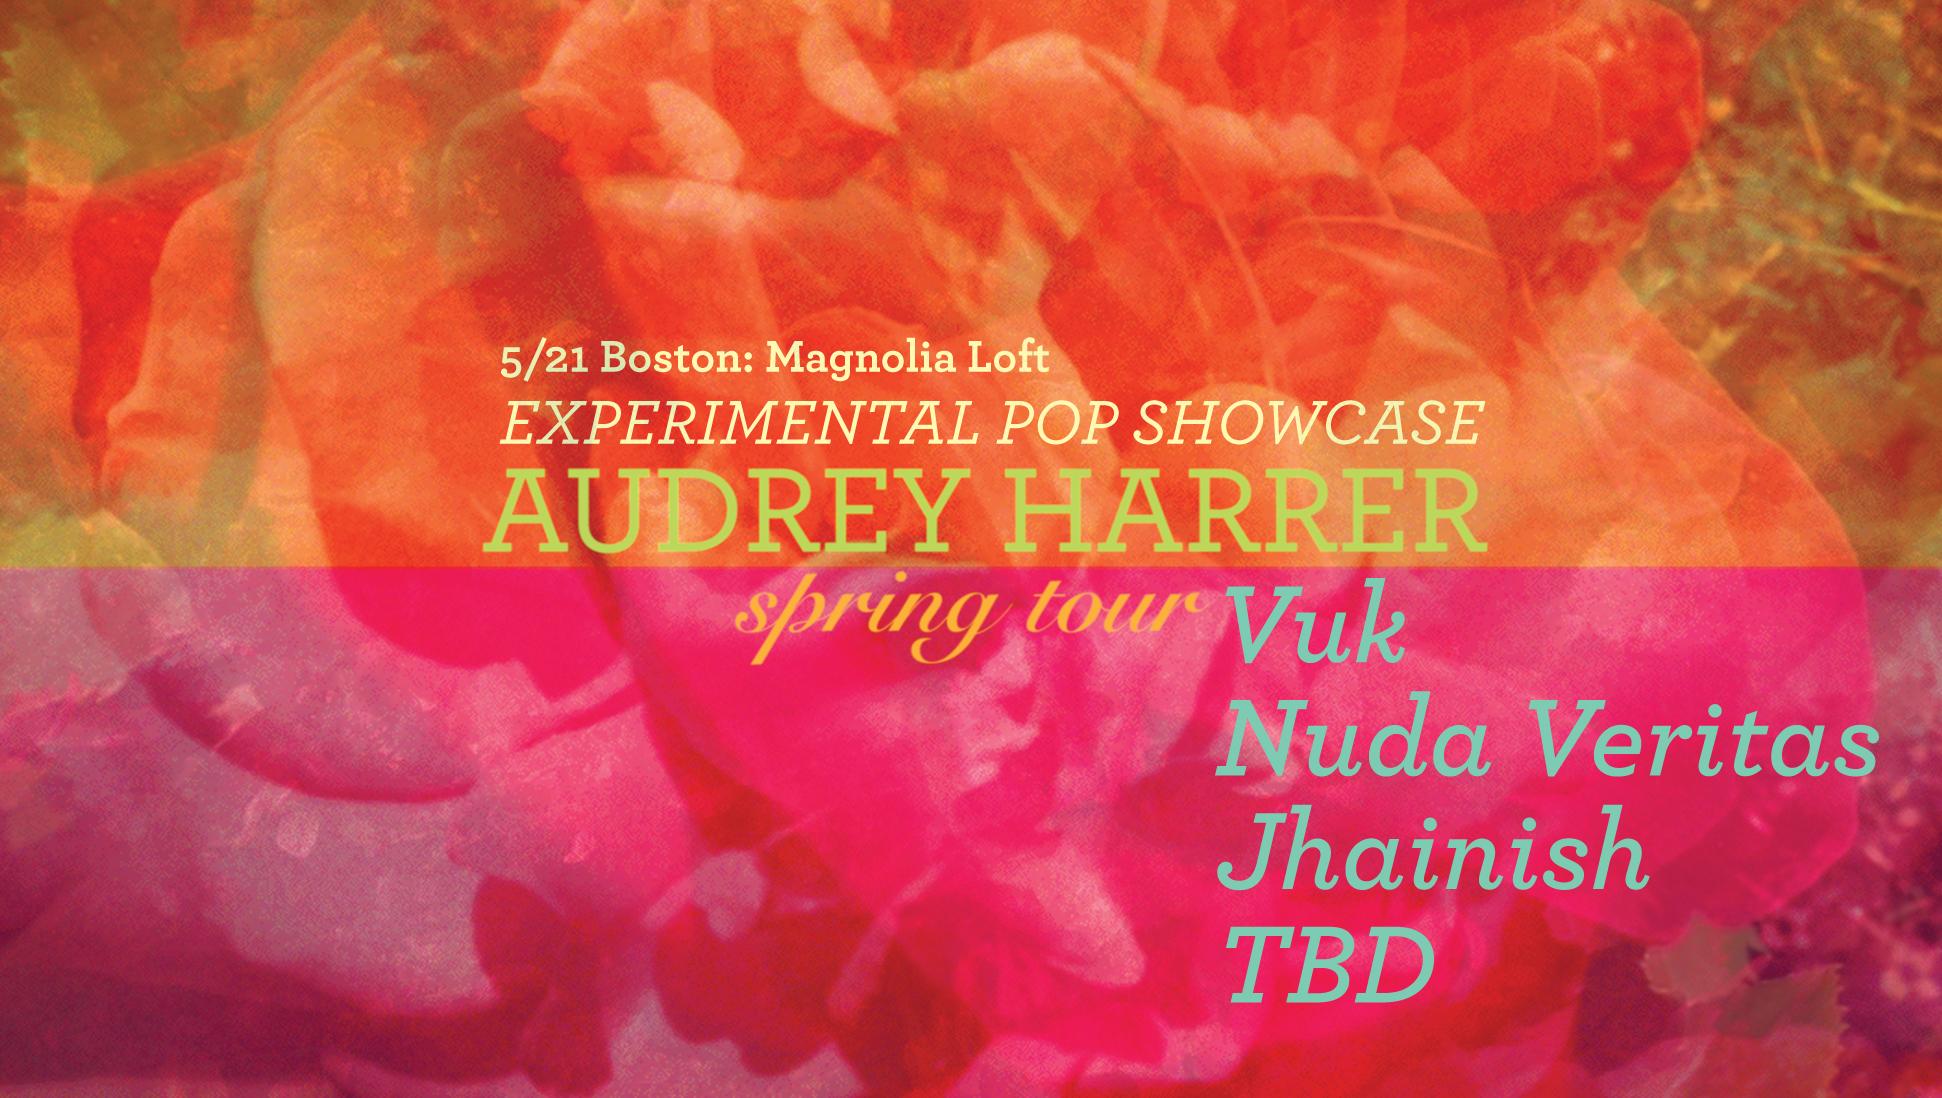 5/21 Boston: Experimental Pop @ Magnolia Loft  JHAINISH // VUK // NUDA VERITAS // AUDREY HARRER   https://www.facebook.com/events/1007306766019373/